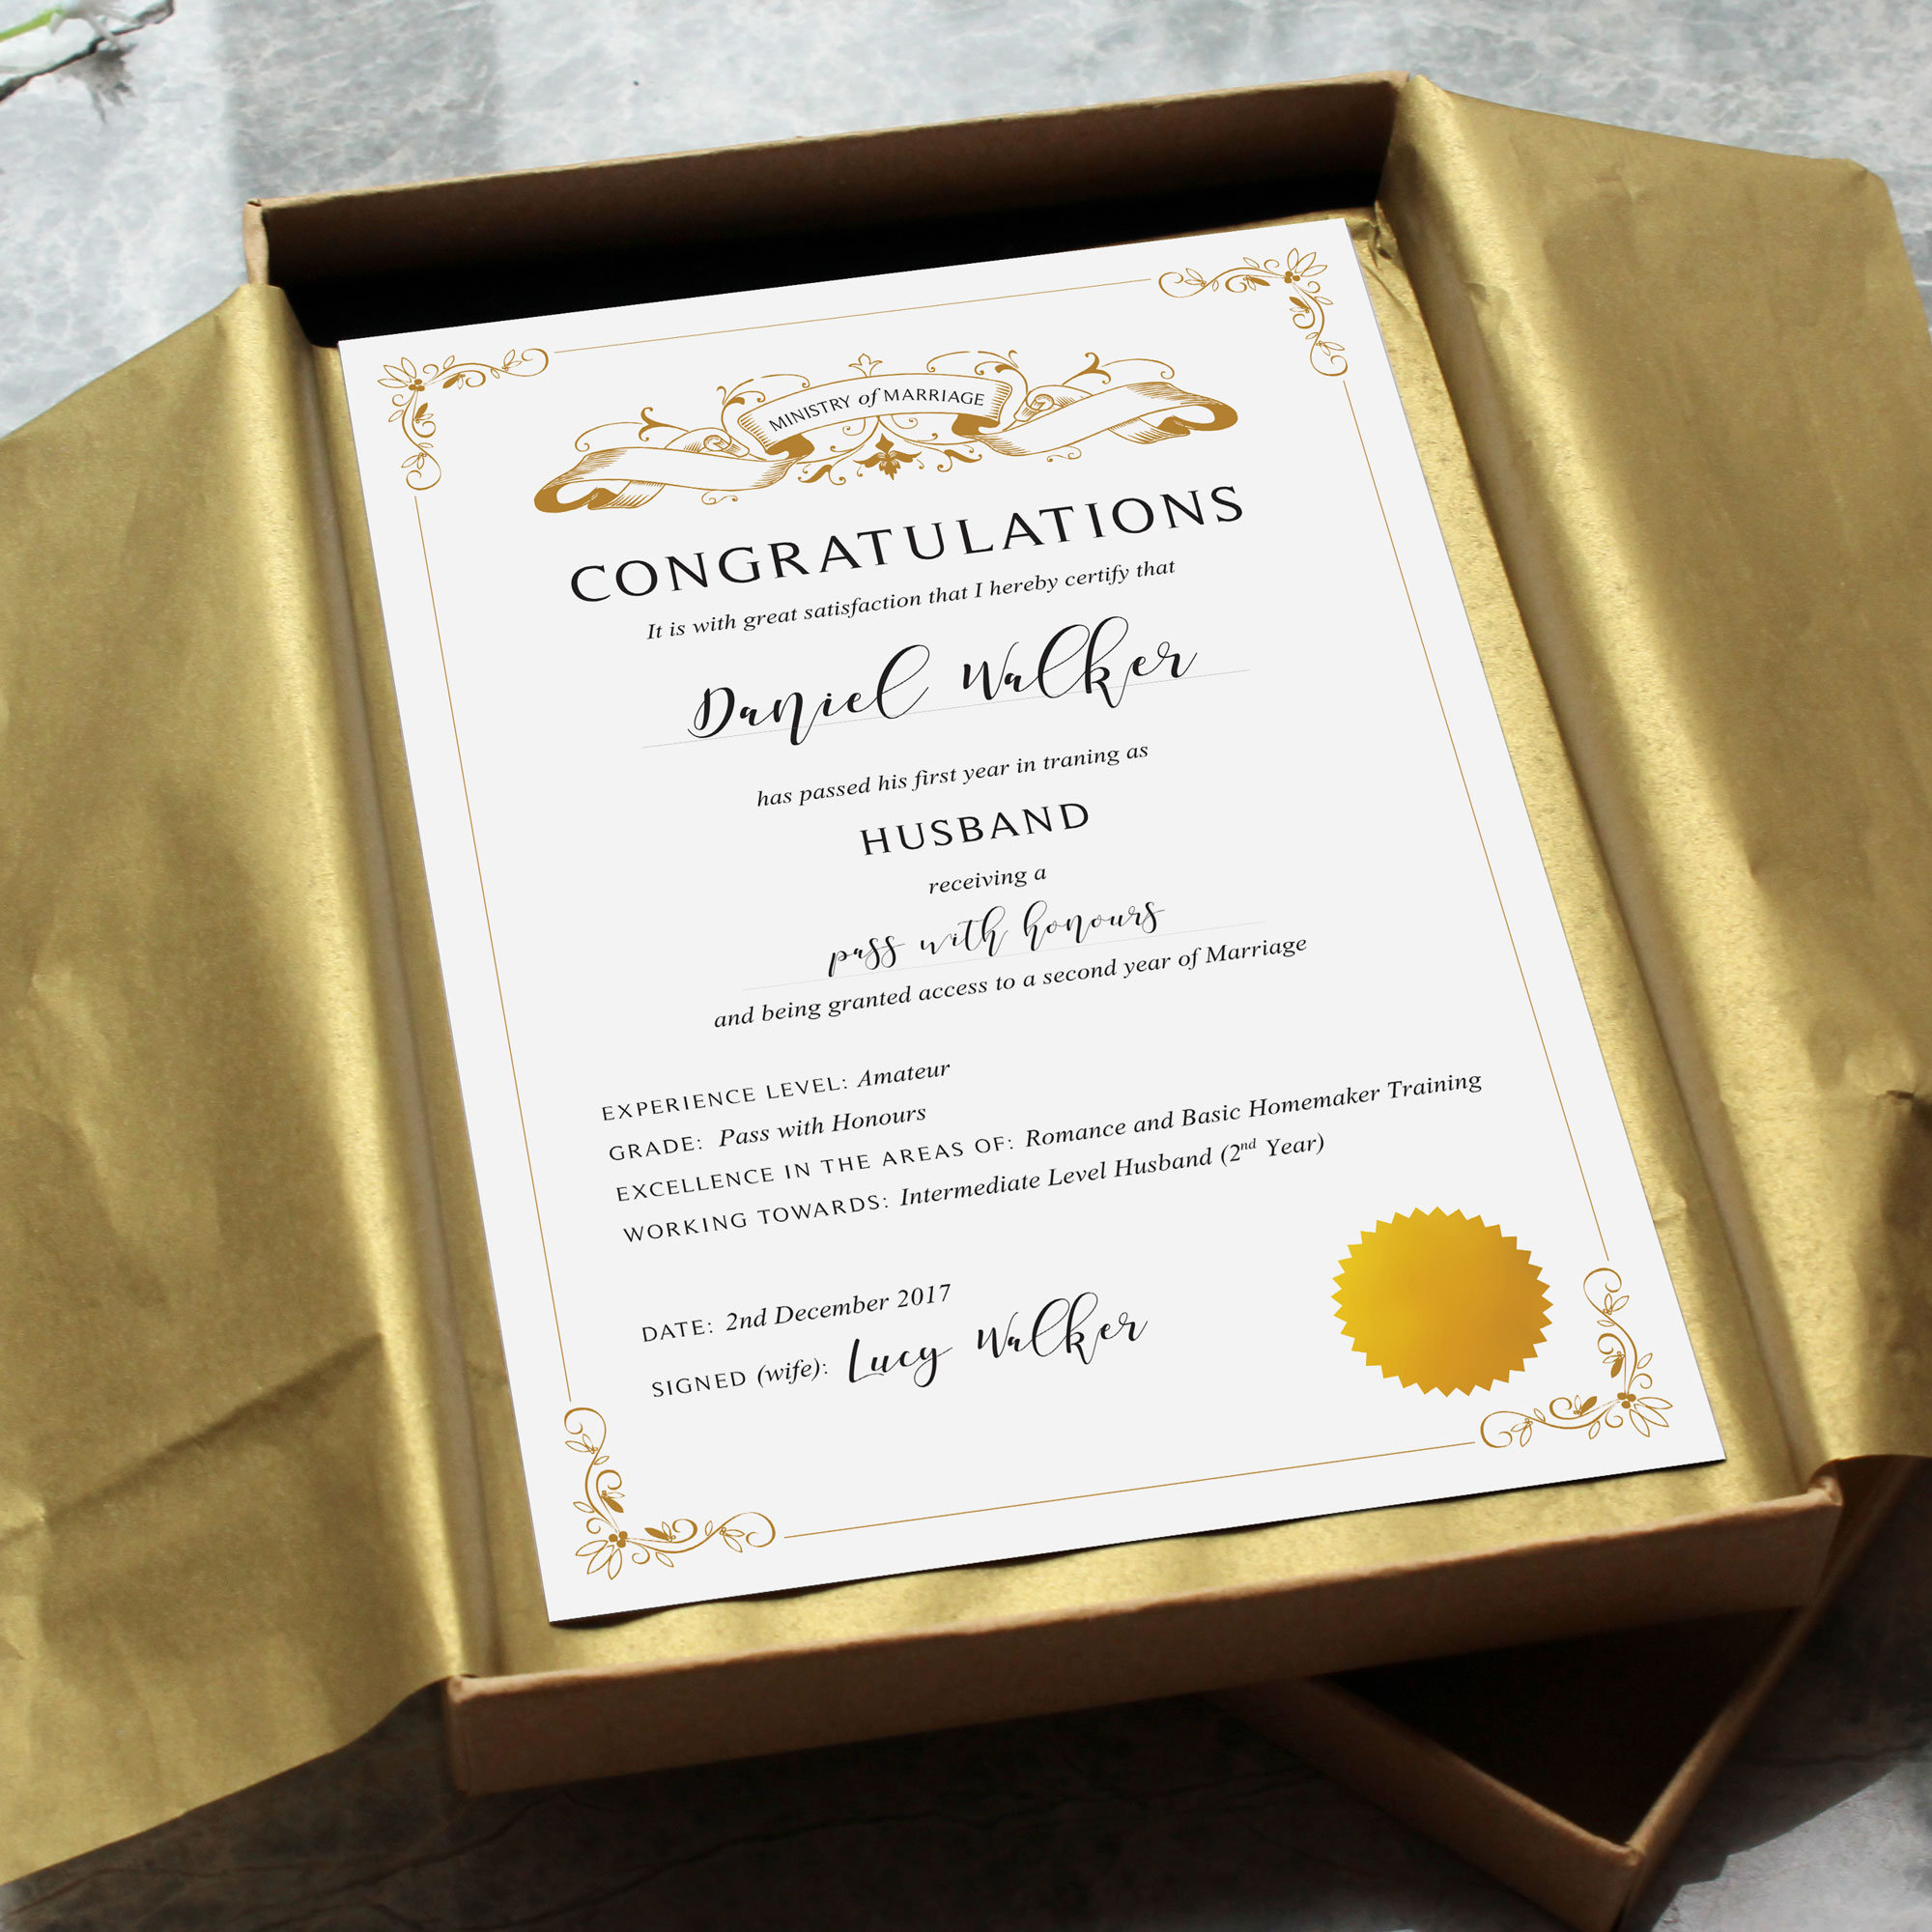 First Year Wedding Anniversary Gifts For Husband.First Anniversary Paper Gift Husband Certificate Vanillaretro